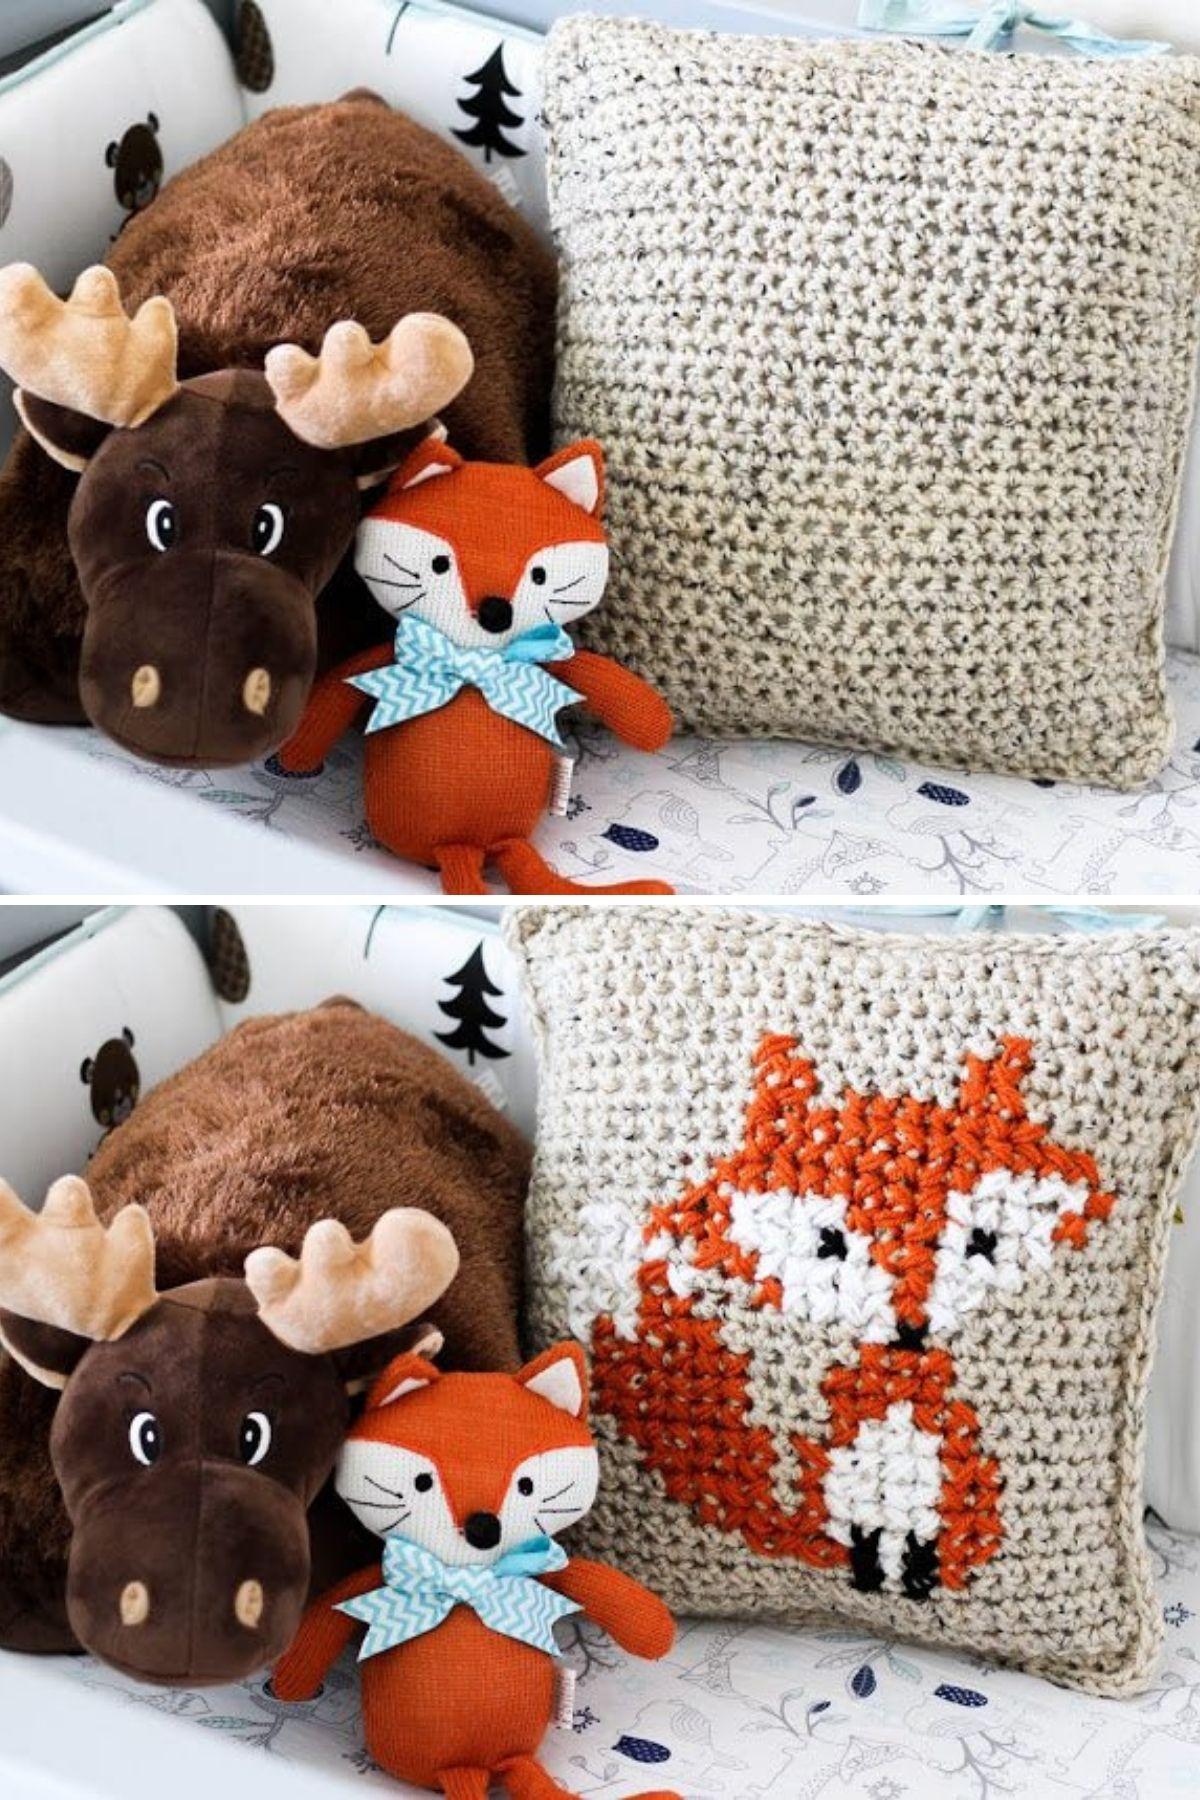 Cream fox pillow next to stuffed animals